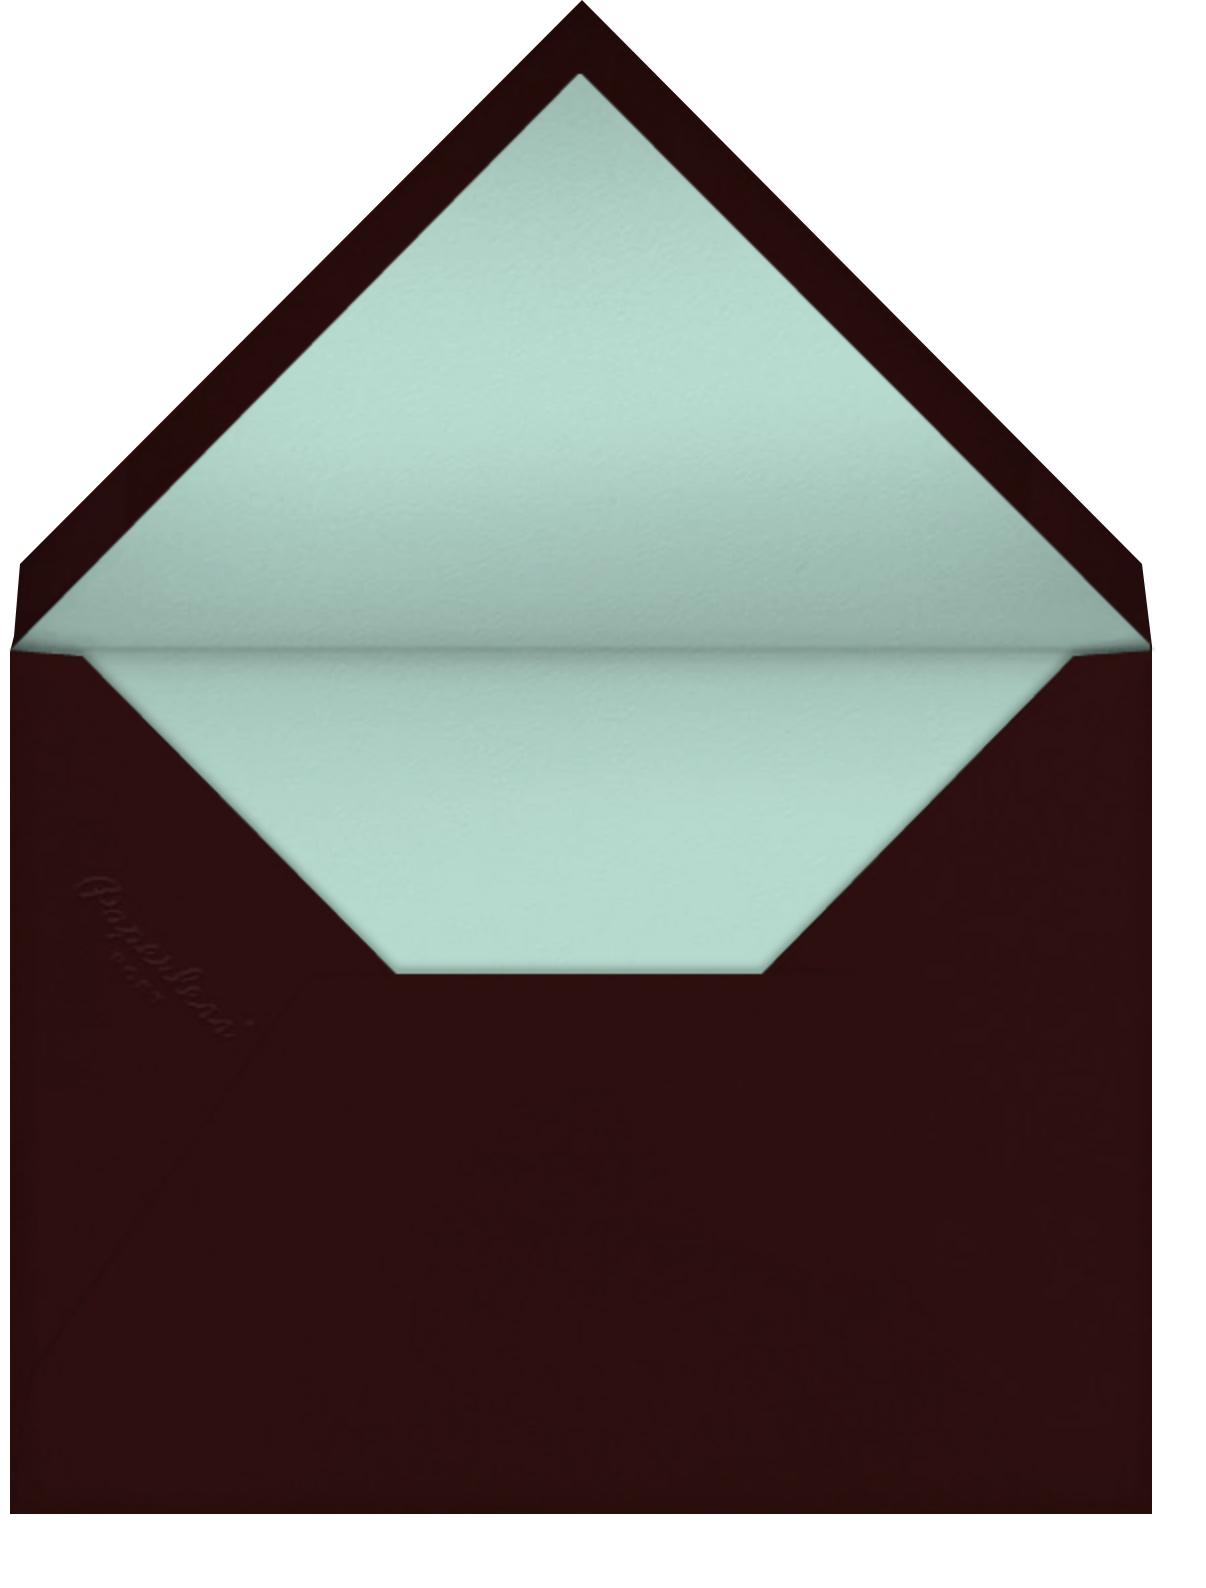 At the Table (Sarah Burwash) - Red Cap Cards - Envelope